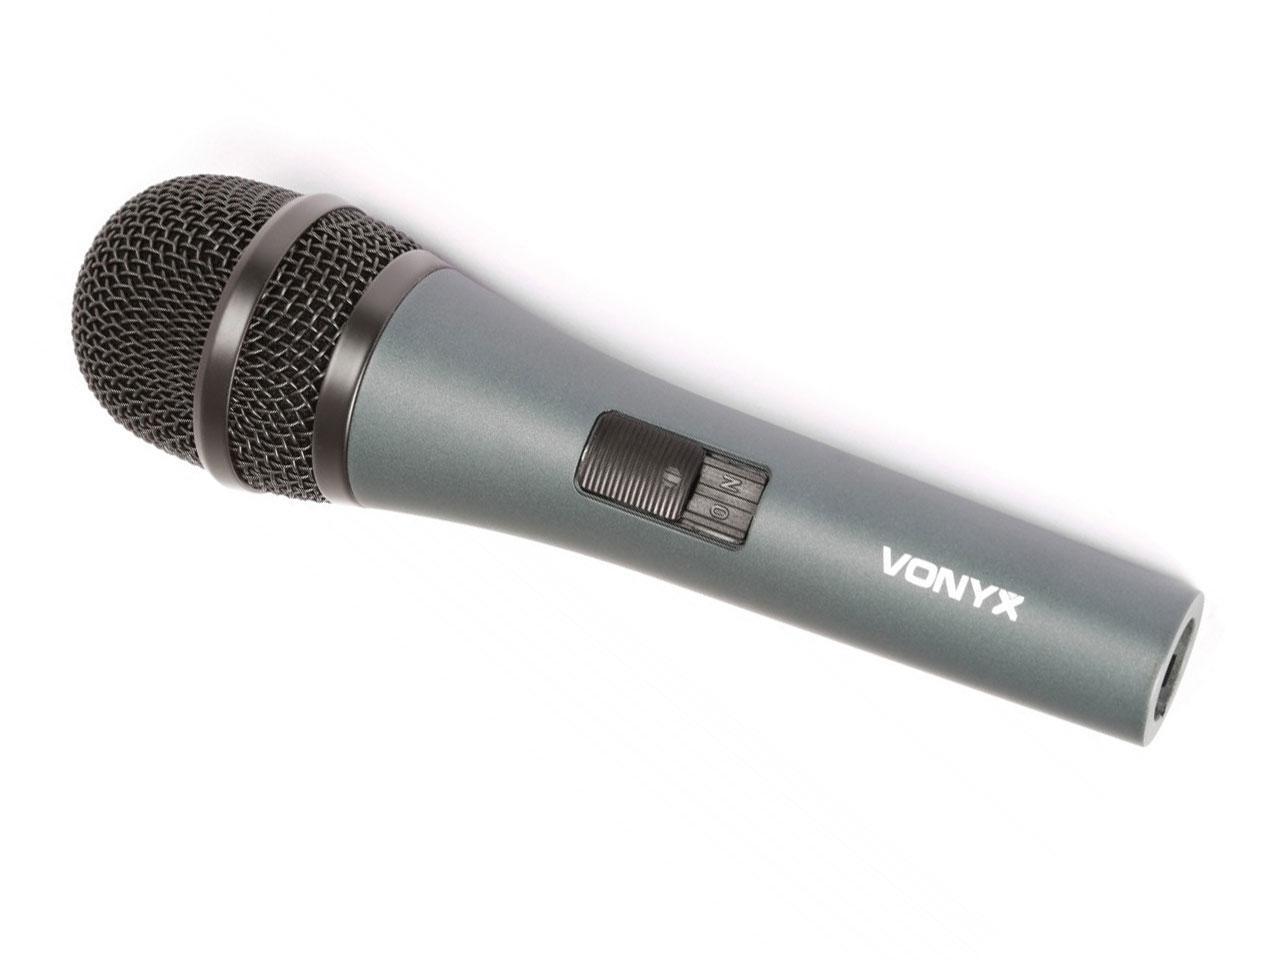 Mikrofon VONYX DM825 + záruka 3 roky!